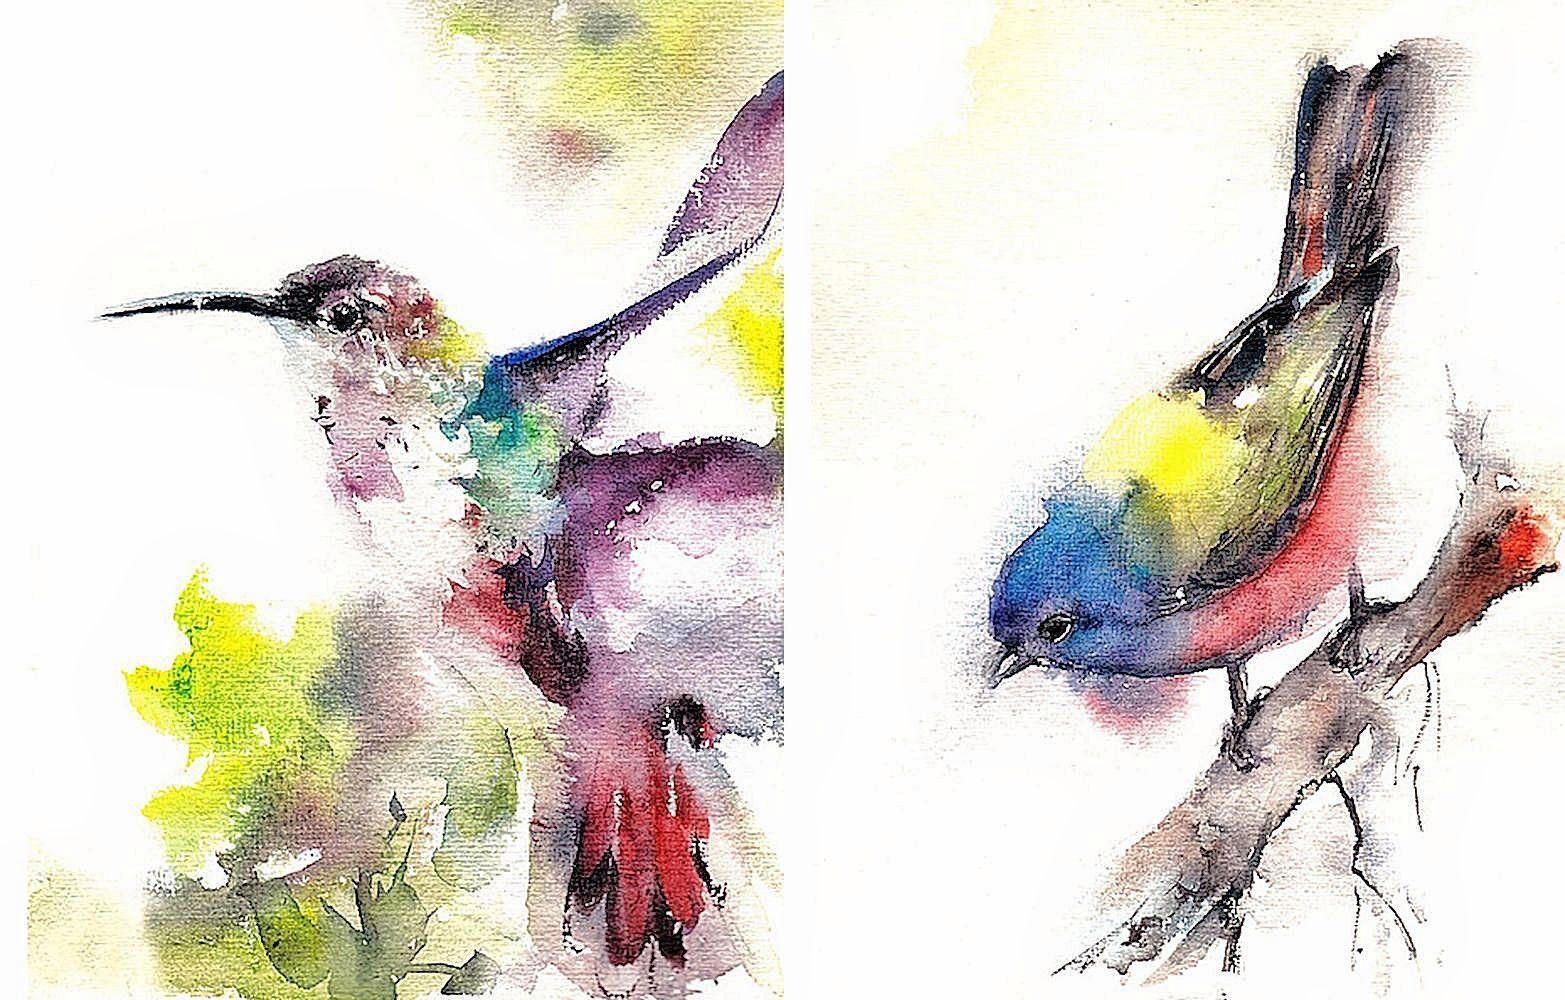 Home Affaire Bild, Kunstdruck, »Cannotstop / Kolibri, Ammer«, 2x 40/50/1,3 cm